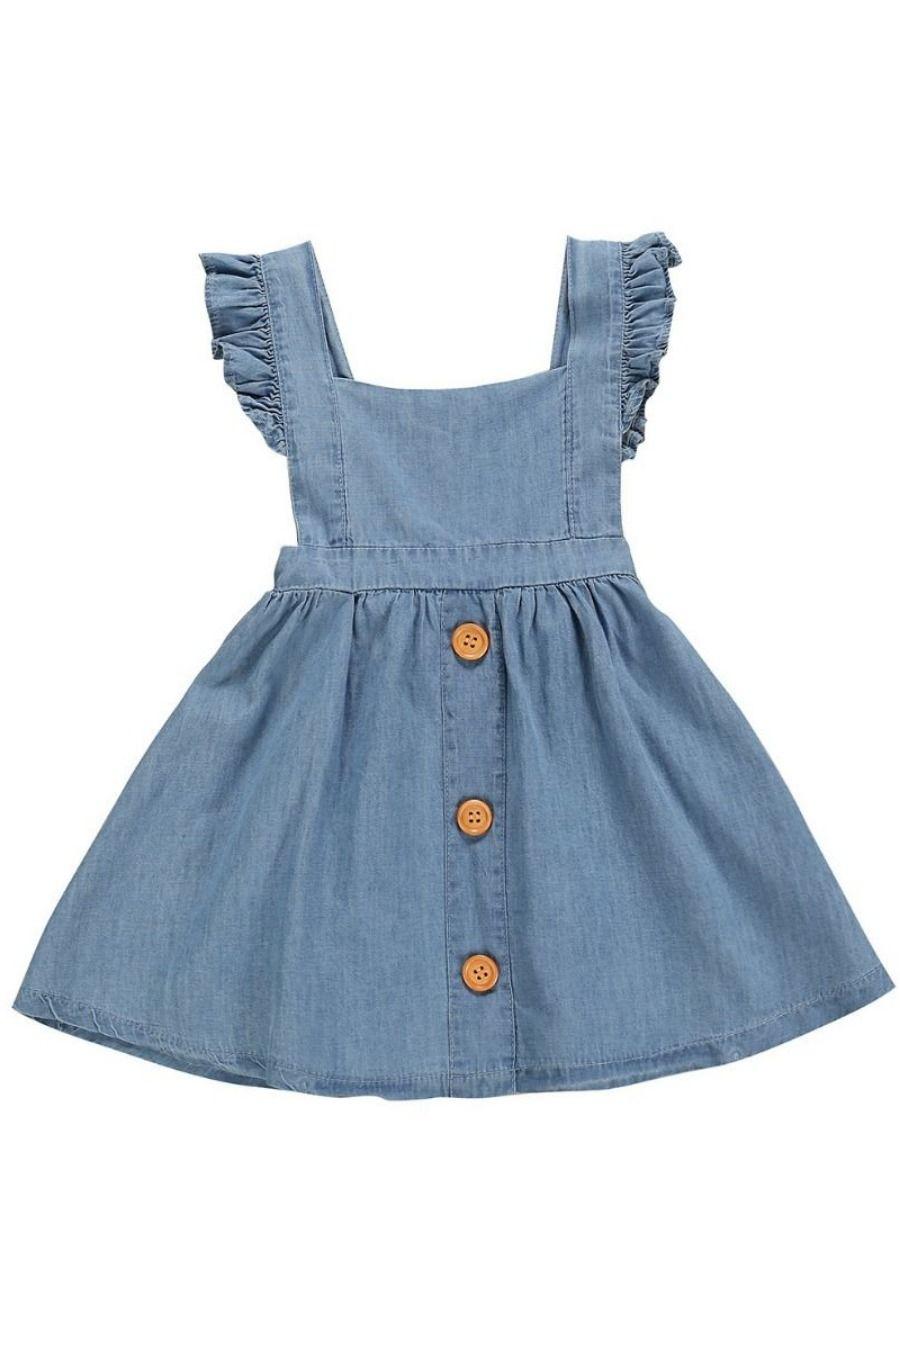 Ruffle Backless Denim Dress Girls Denim Dress Dresses Kids Girl Kids Outfits [ 1350 x 900 Pixel ]